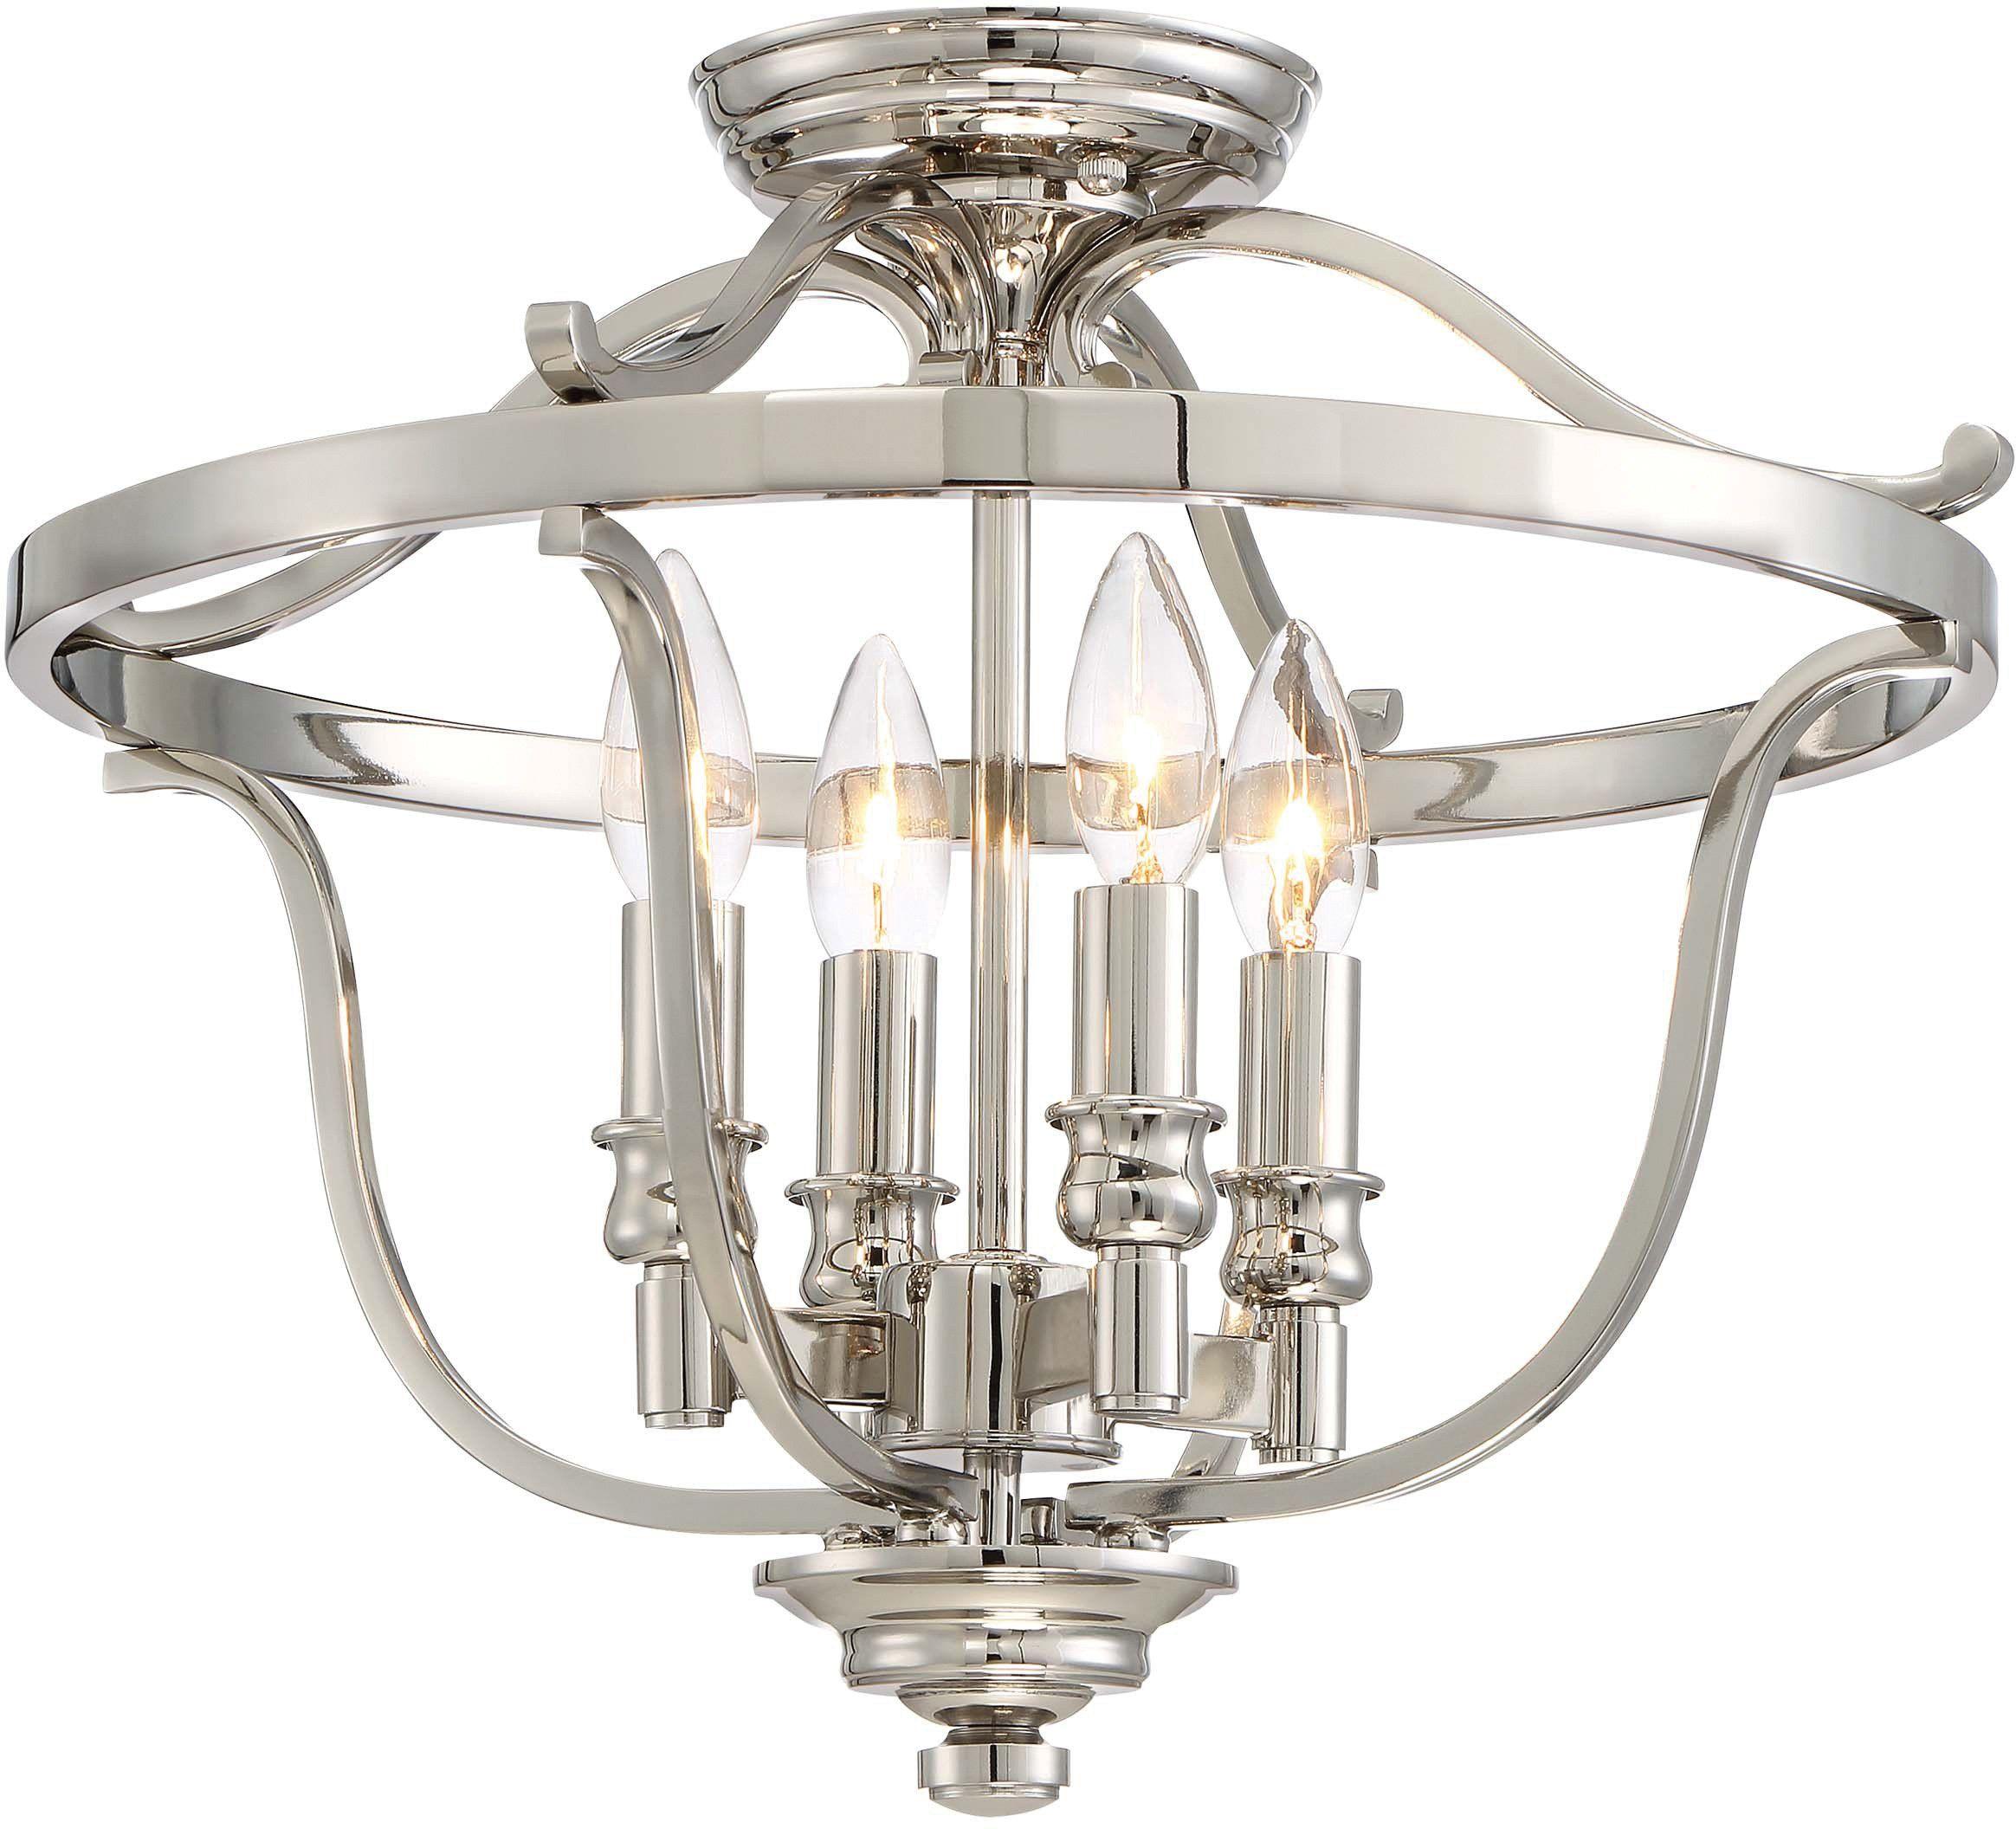 Minka Lavery Semi Flush Mount Ceiling Light 3296 613 Audrey S